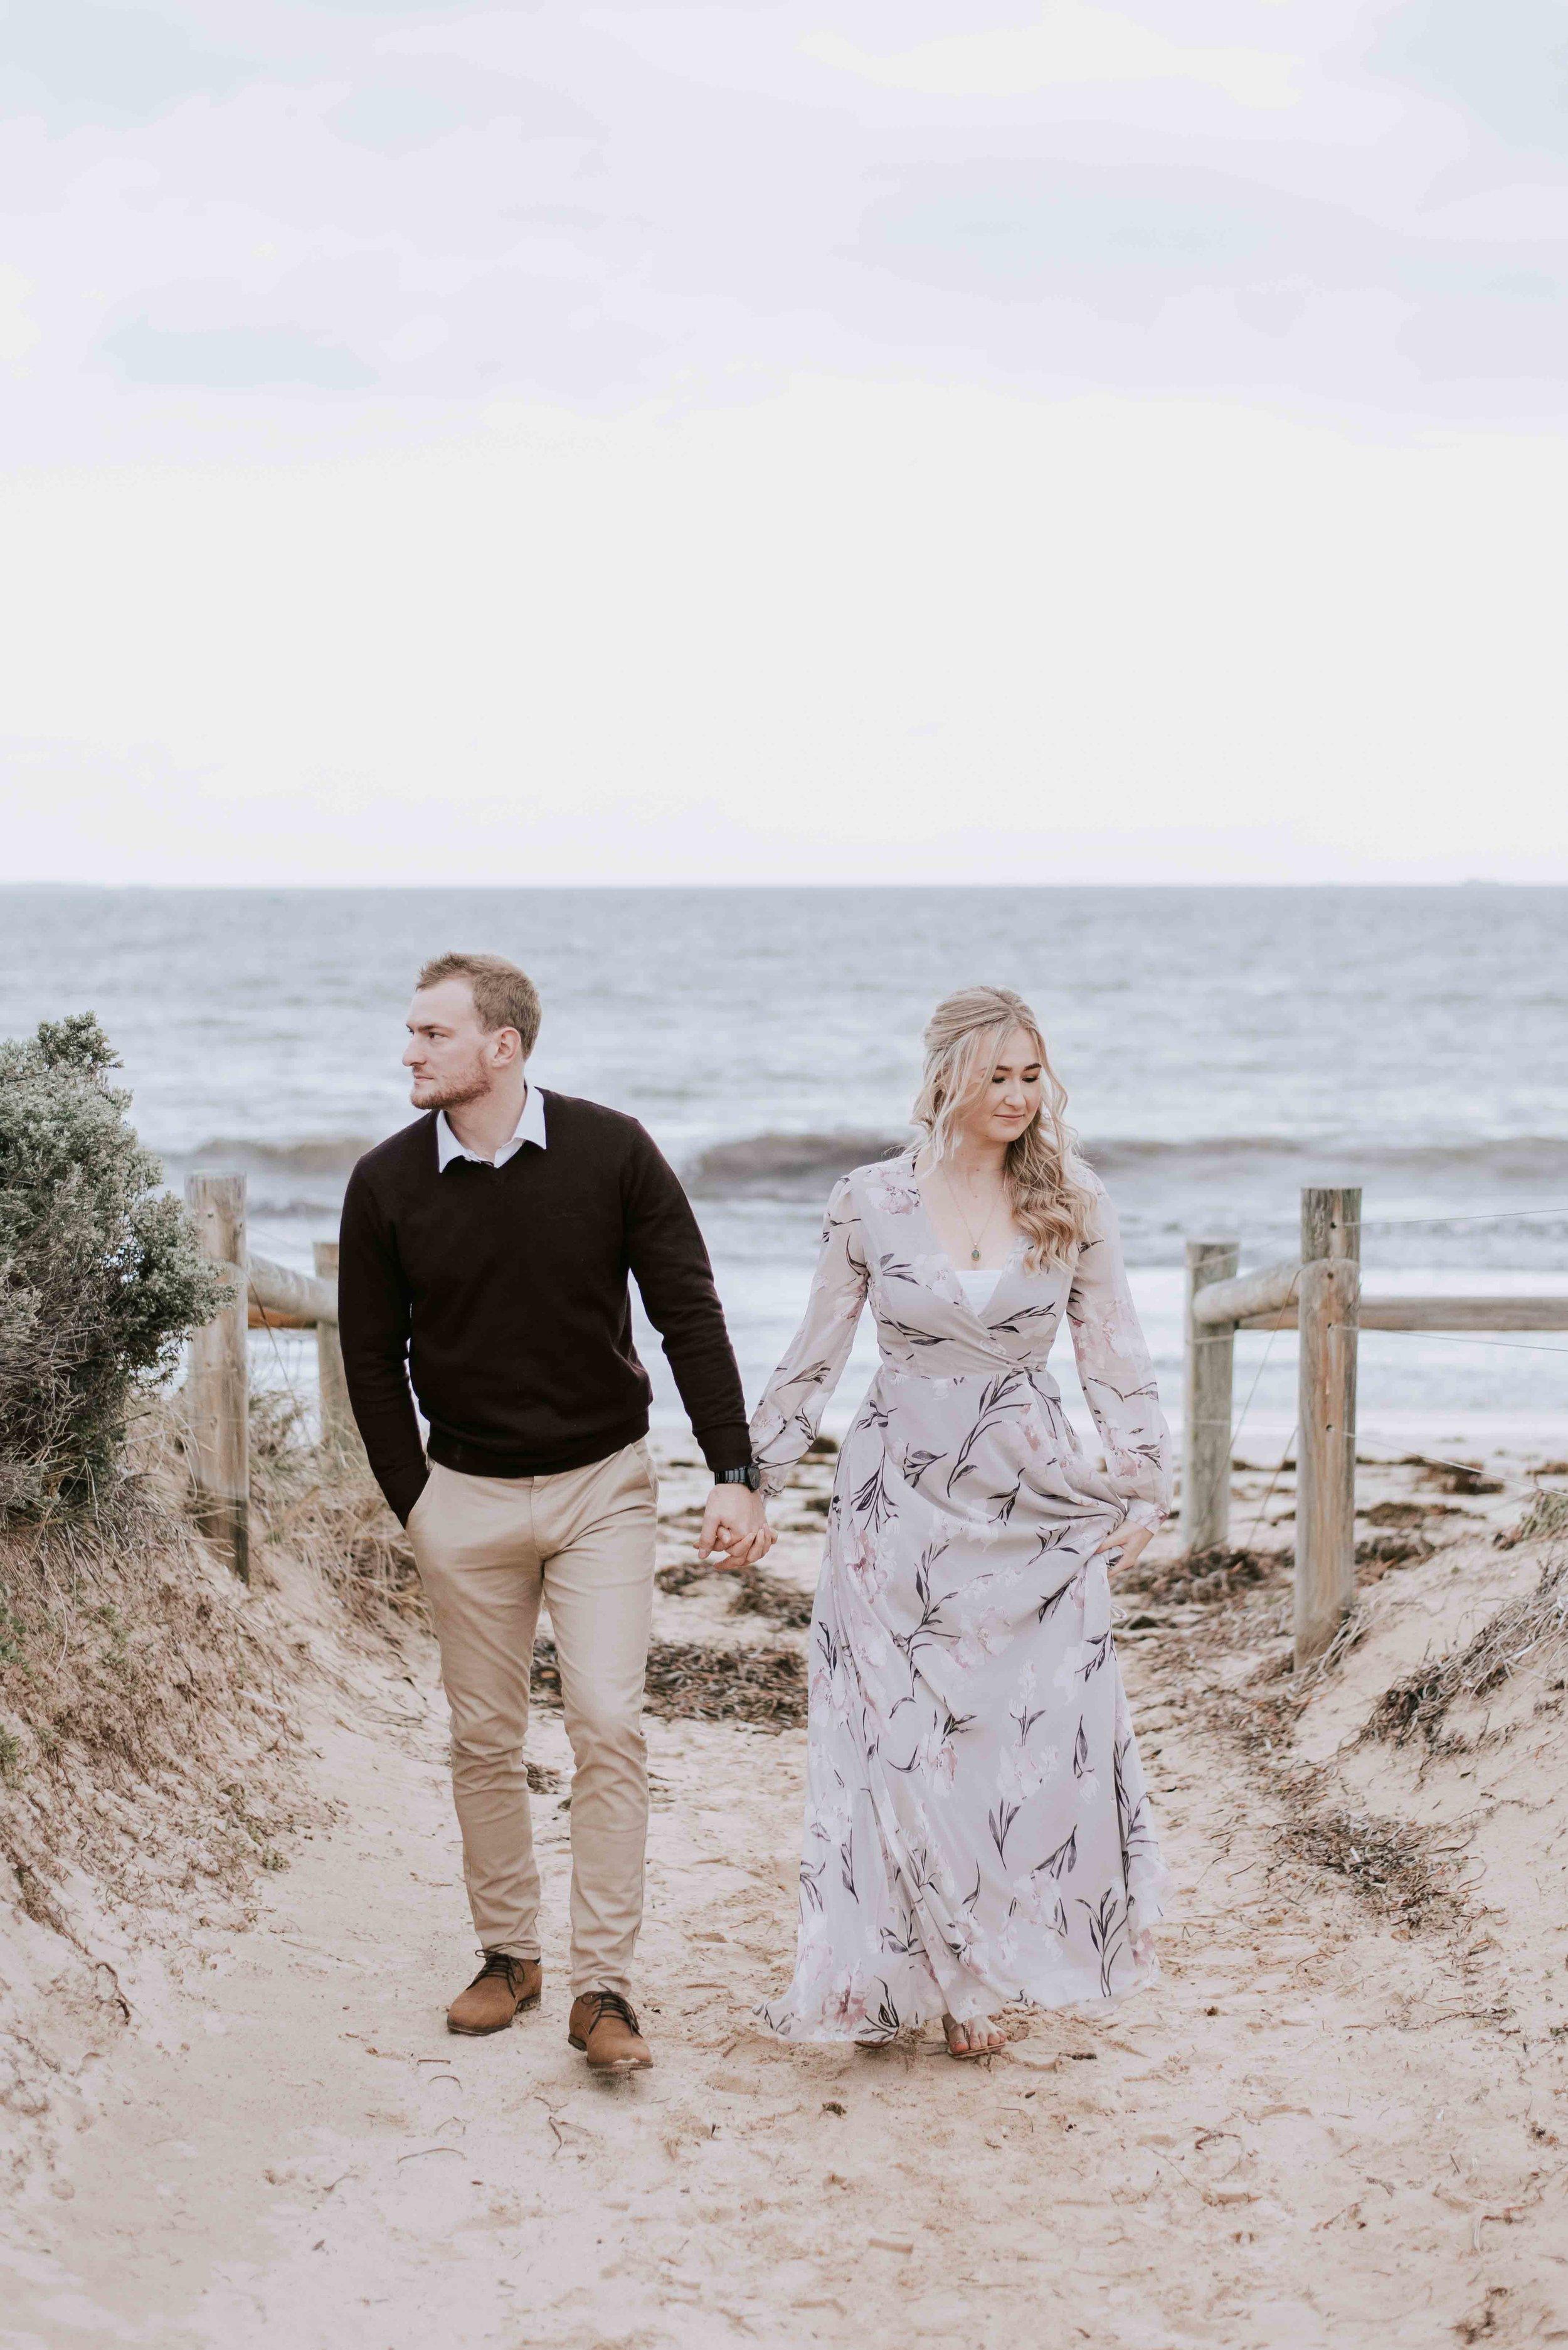 Fremantle winter Engagement Session | amy skinner photography-68.jpg